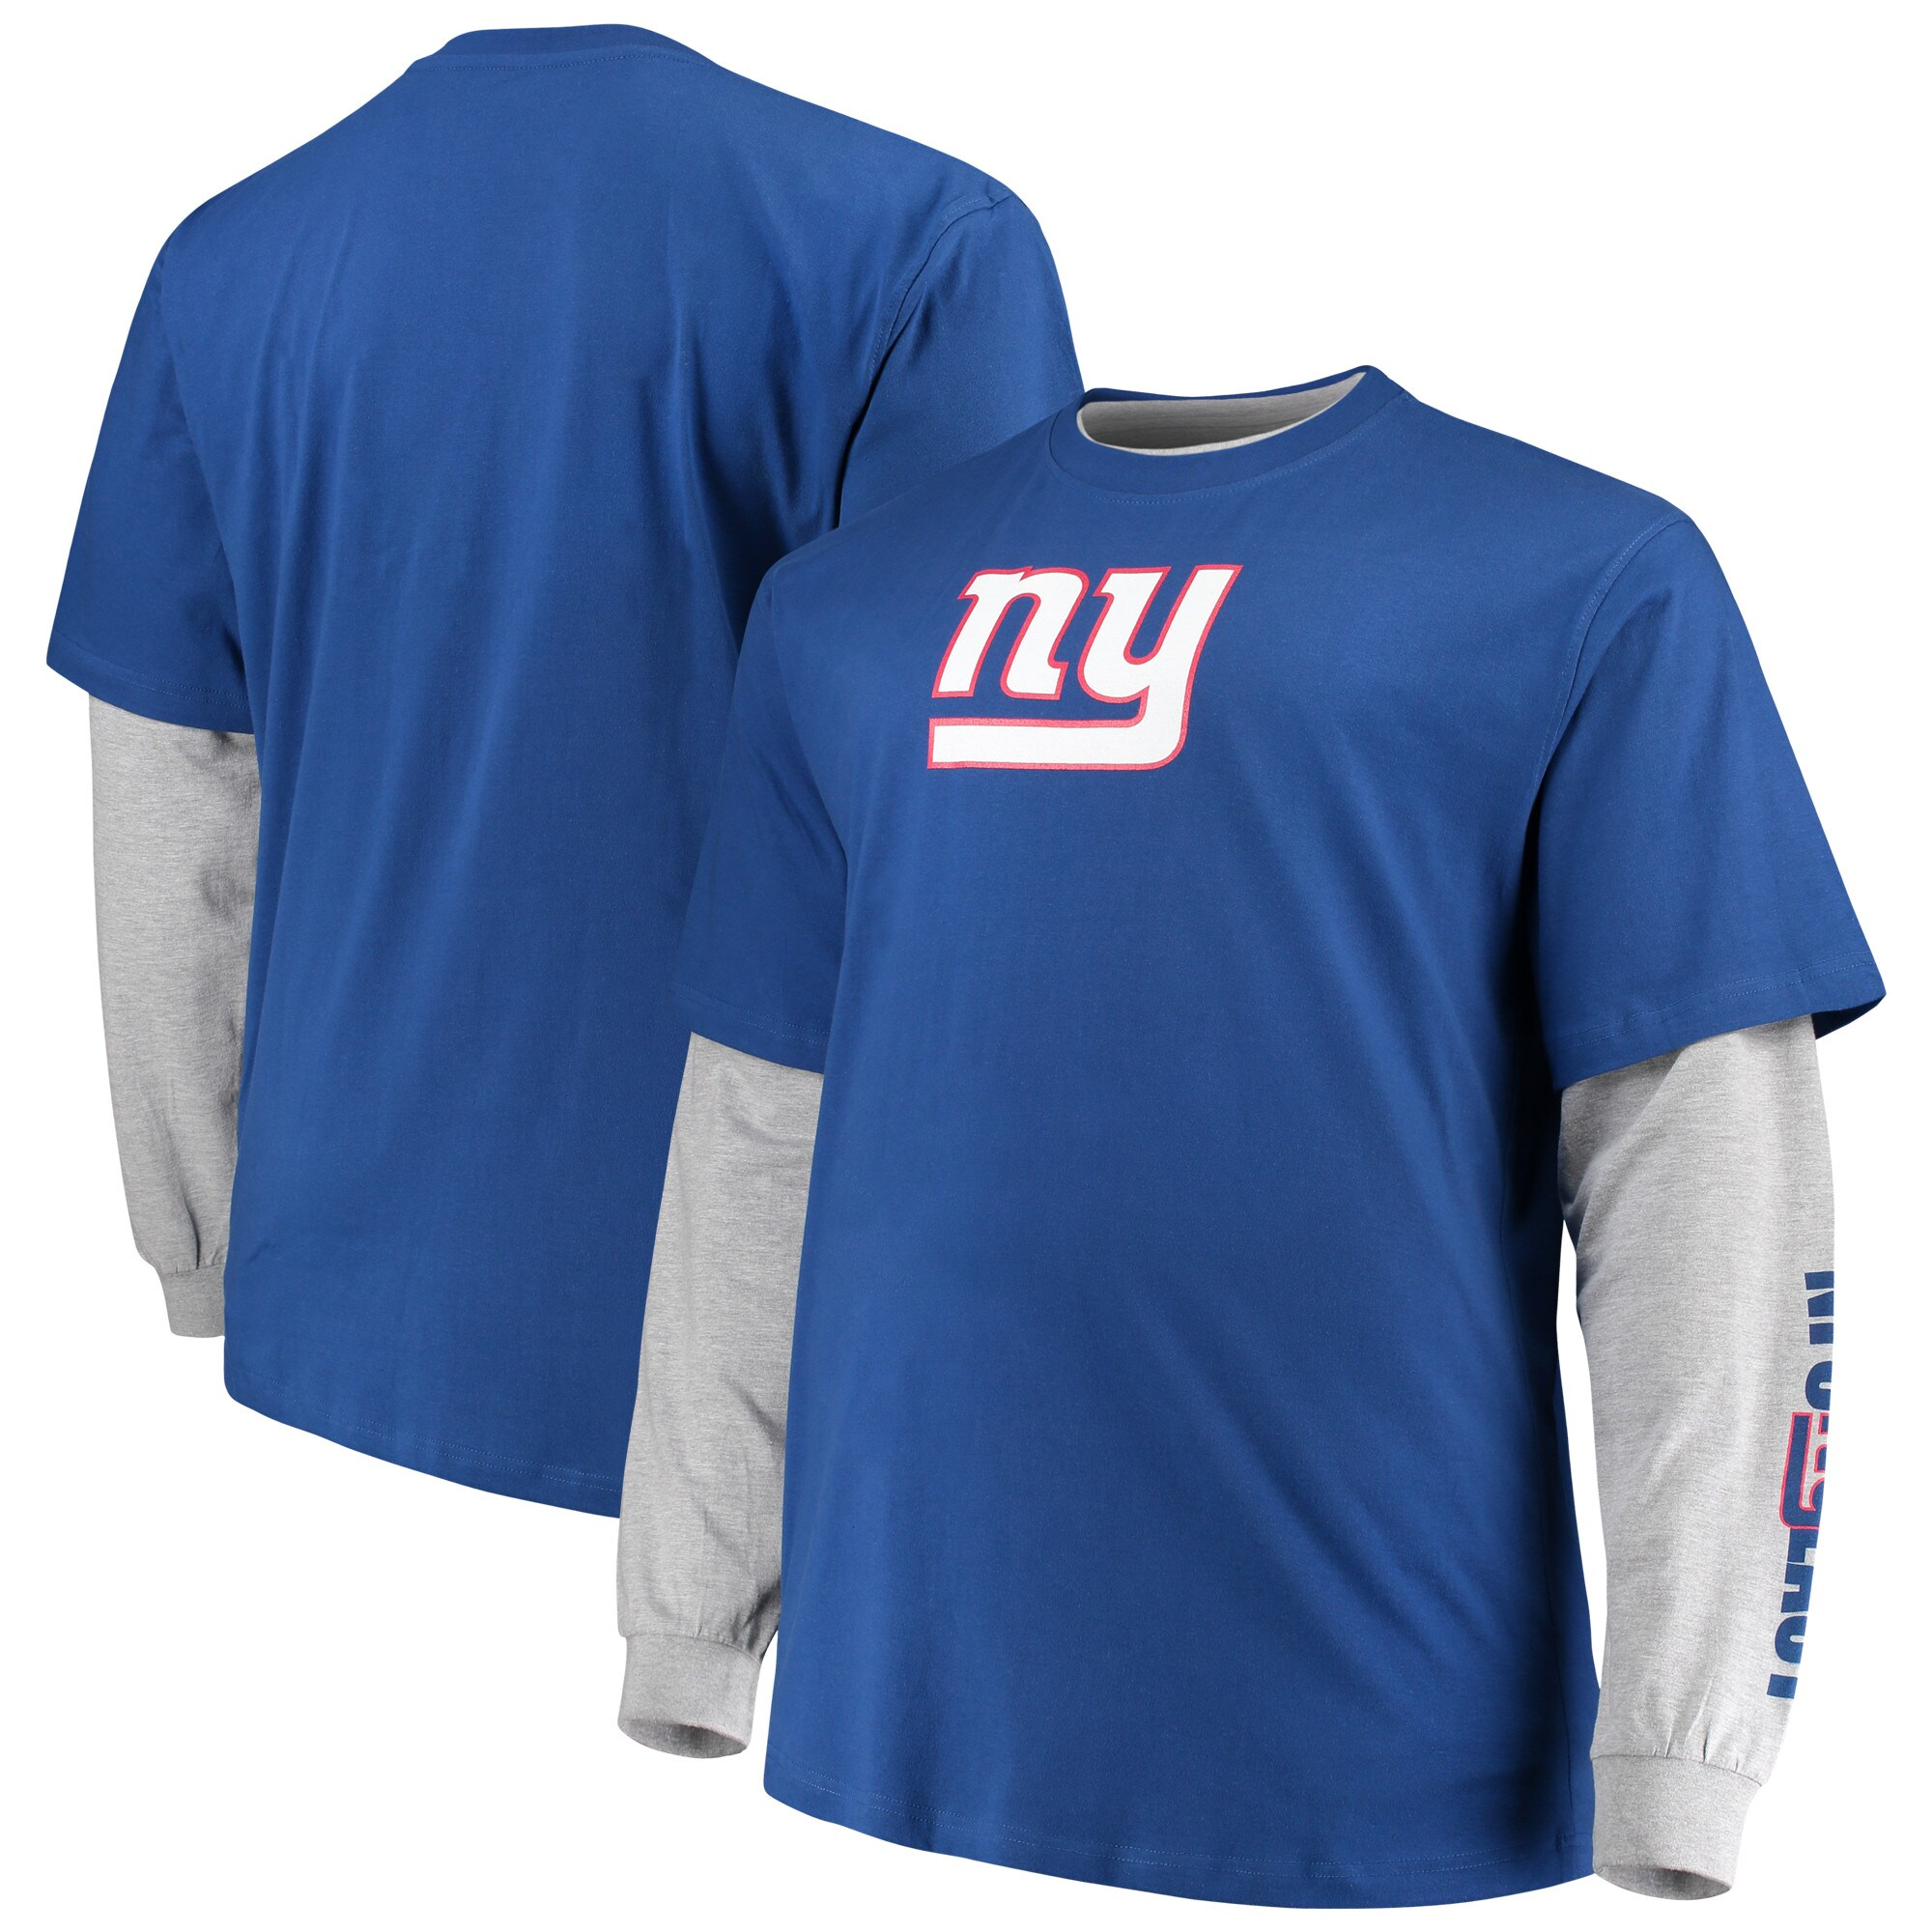 New York Giants Majestic Big & Tall T-Shirt Combo Set - Royal/Heathered Gray